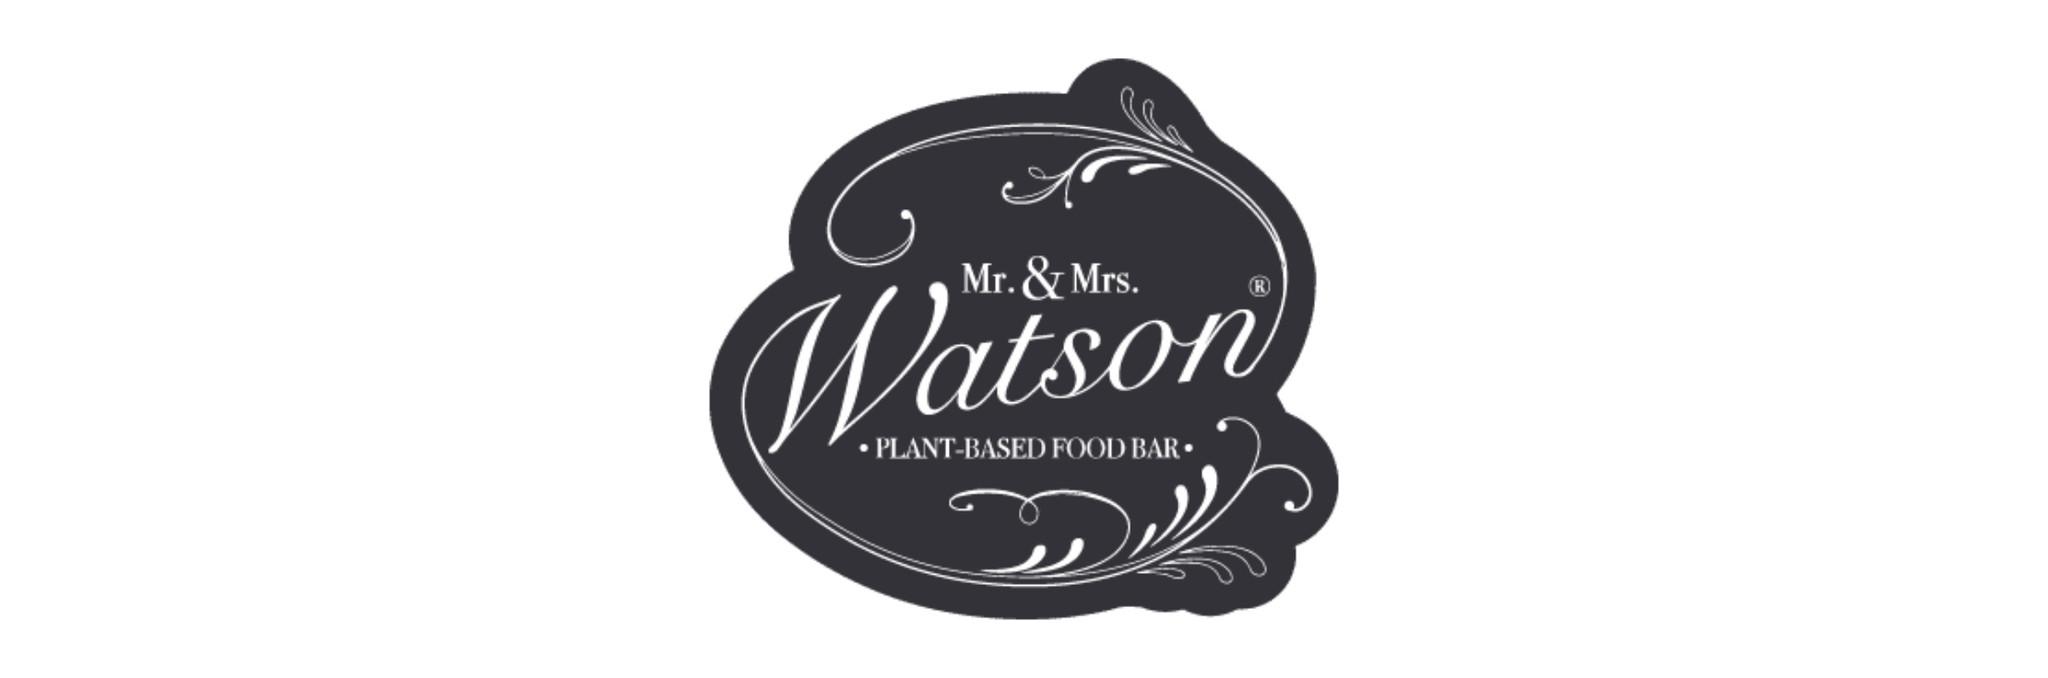 Watson's Food